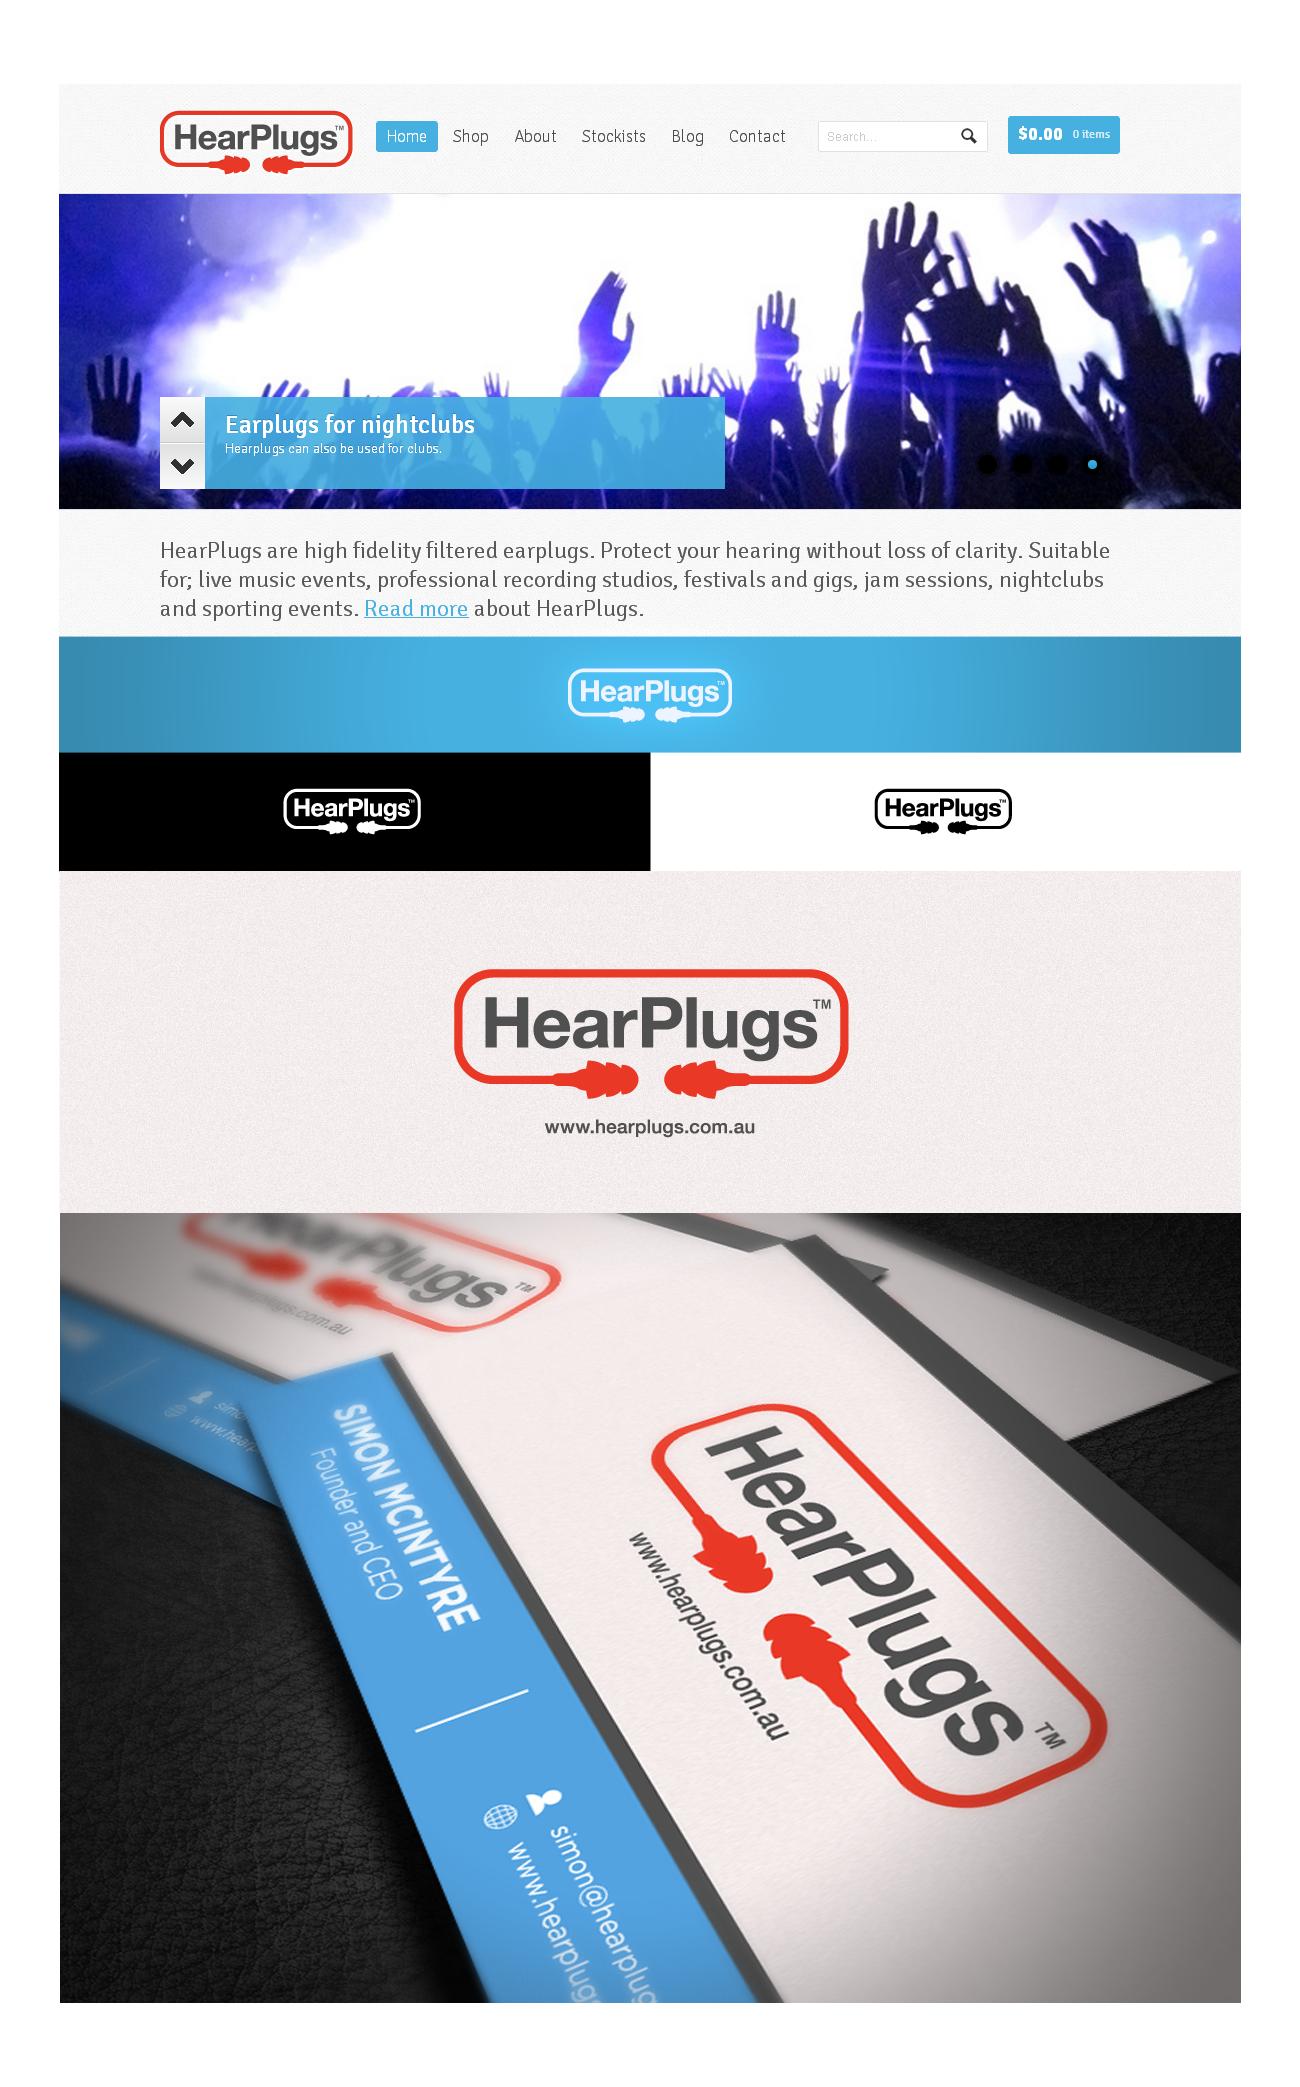 Create the next logo for HearPlugs